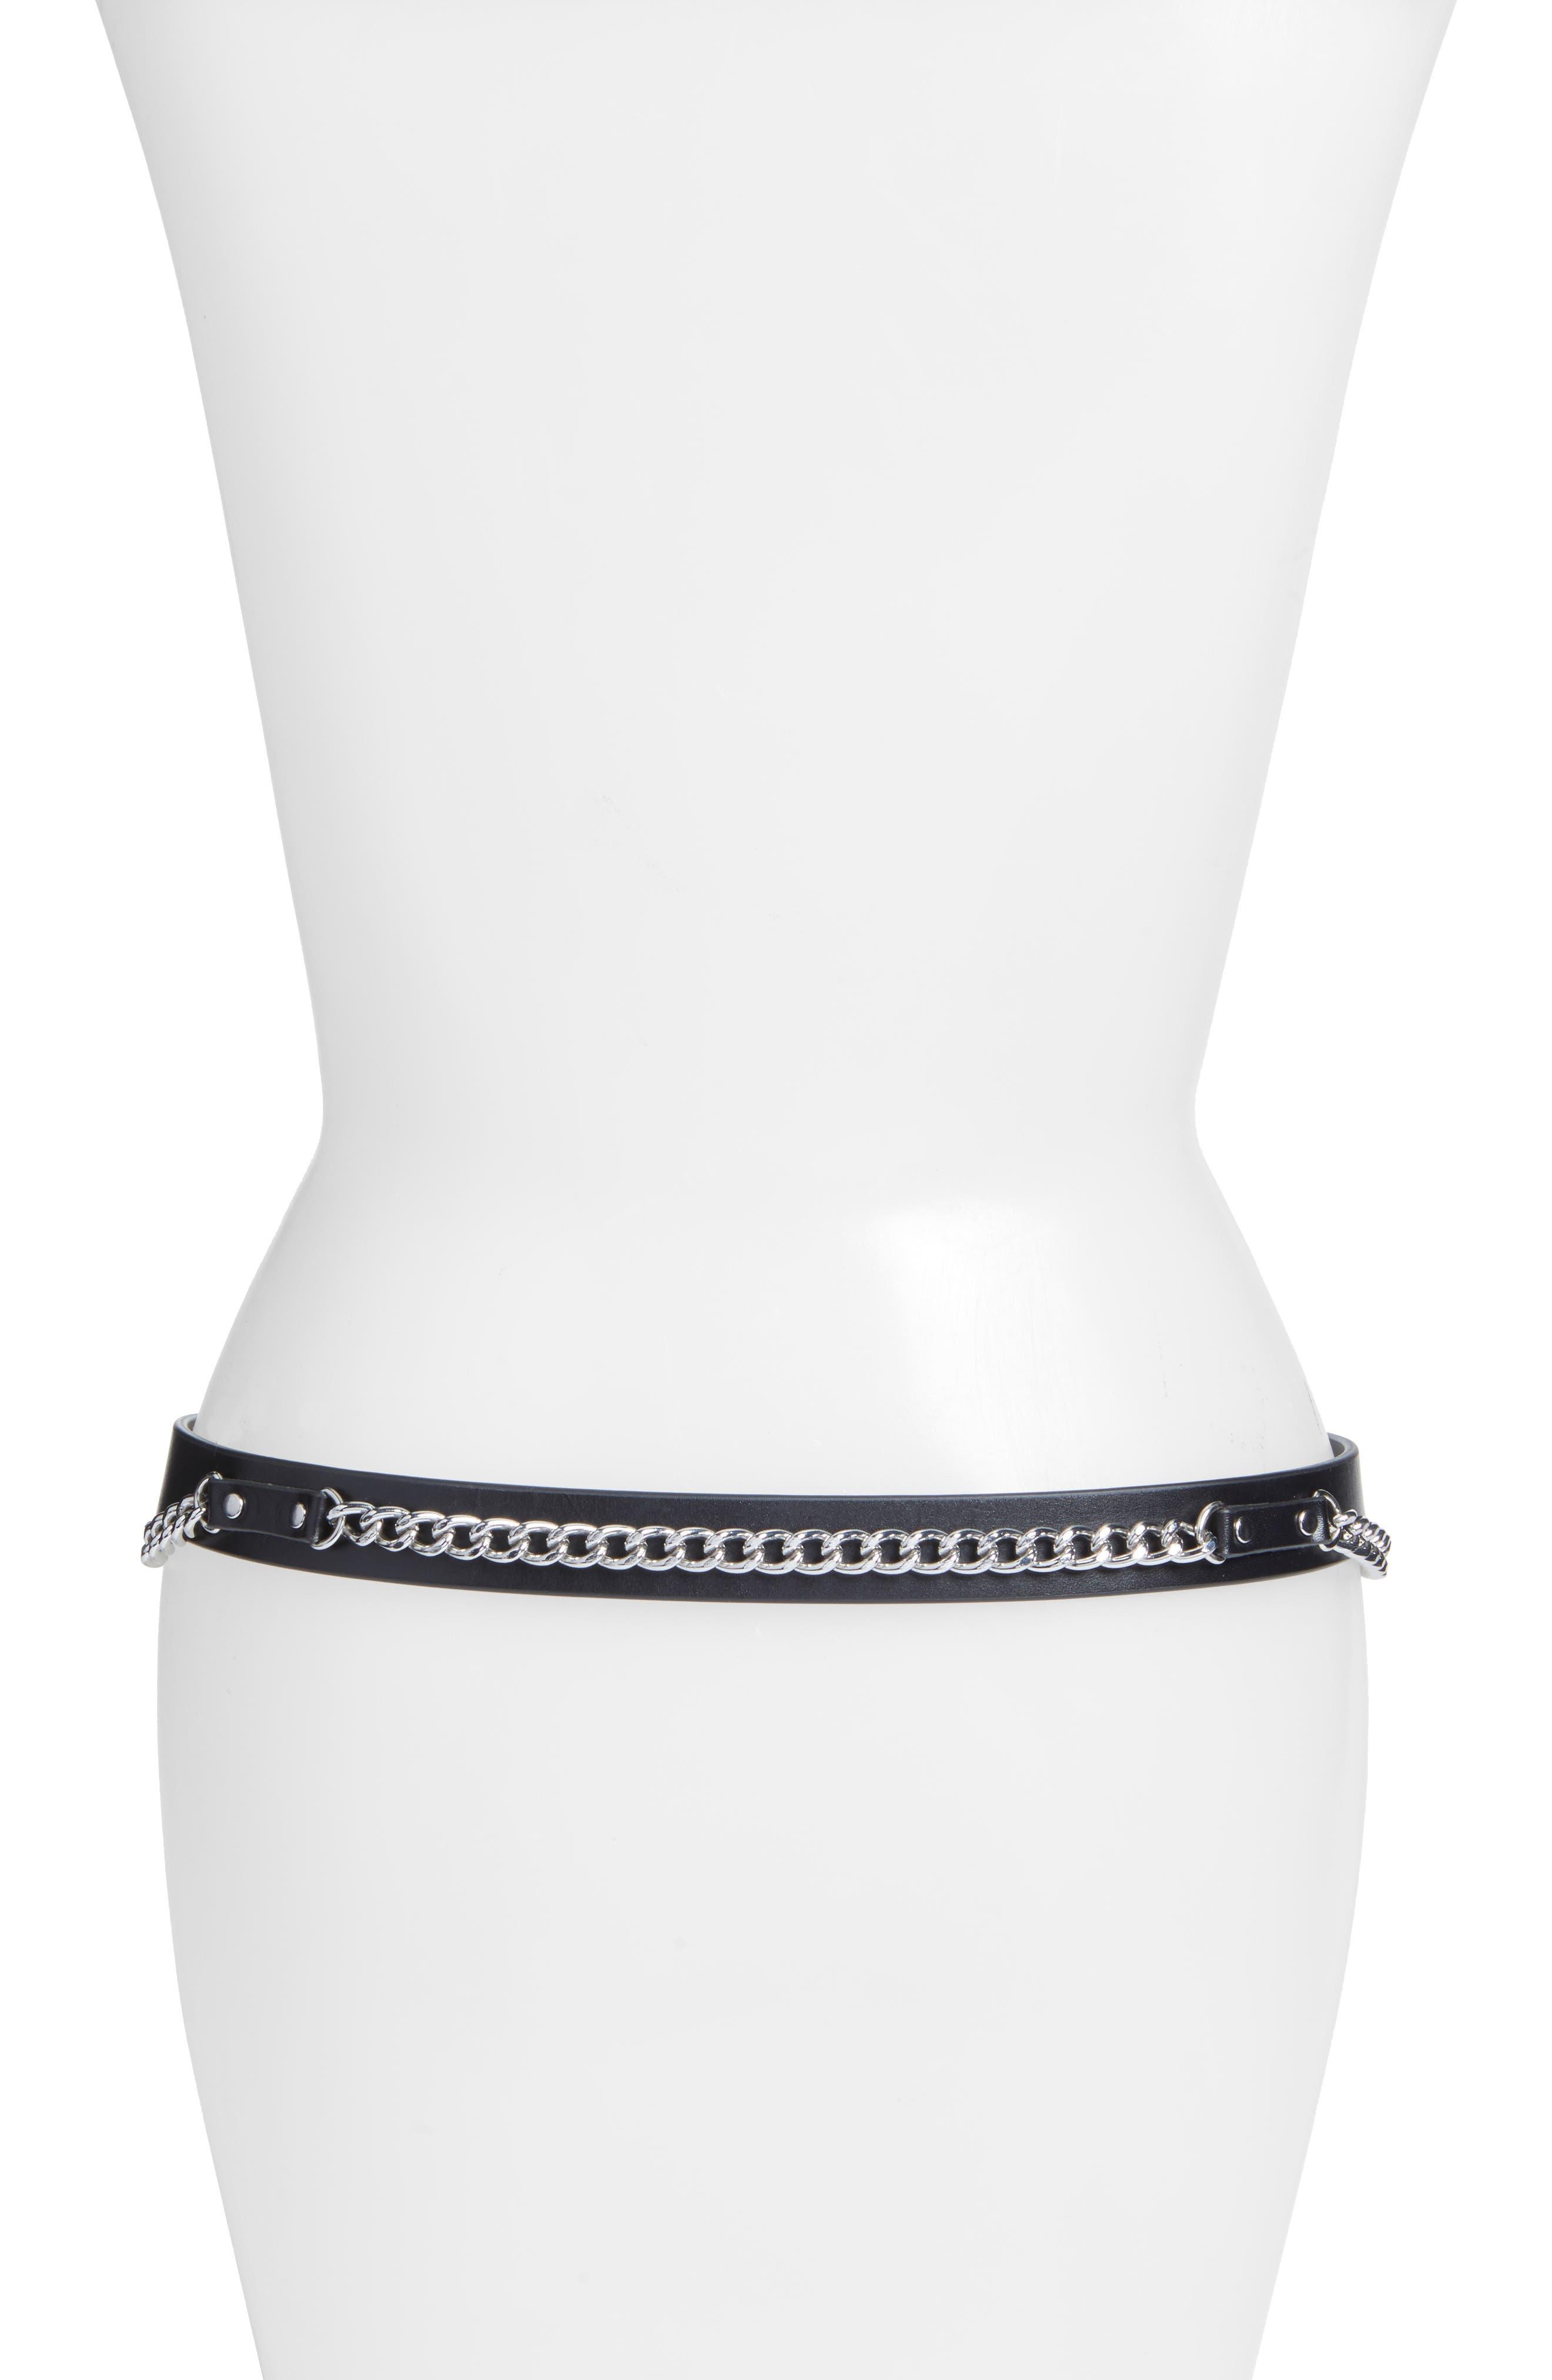 Farah Skinny Calfskin Leather Belt,                             Alternate thumbnail 2, color,                             001